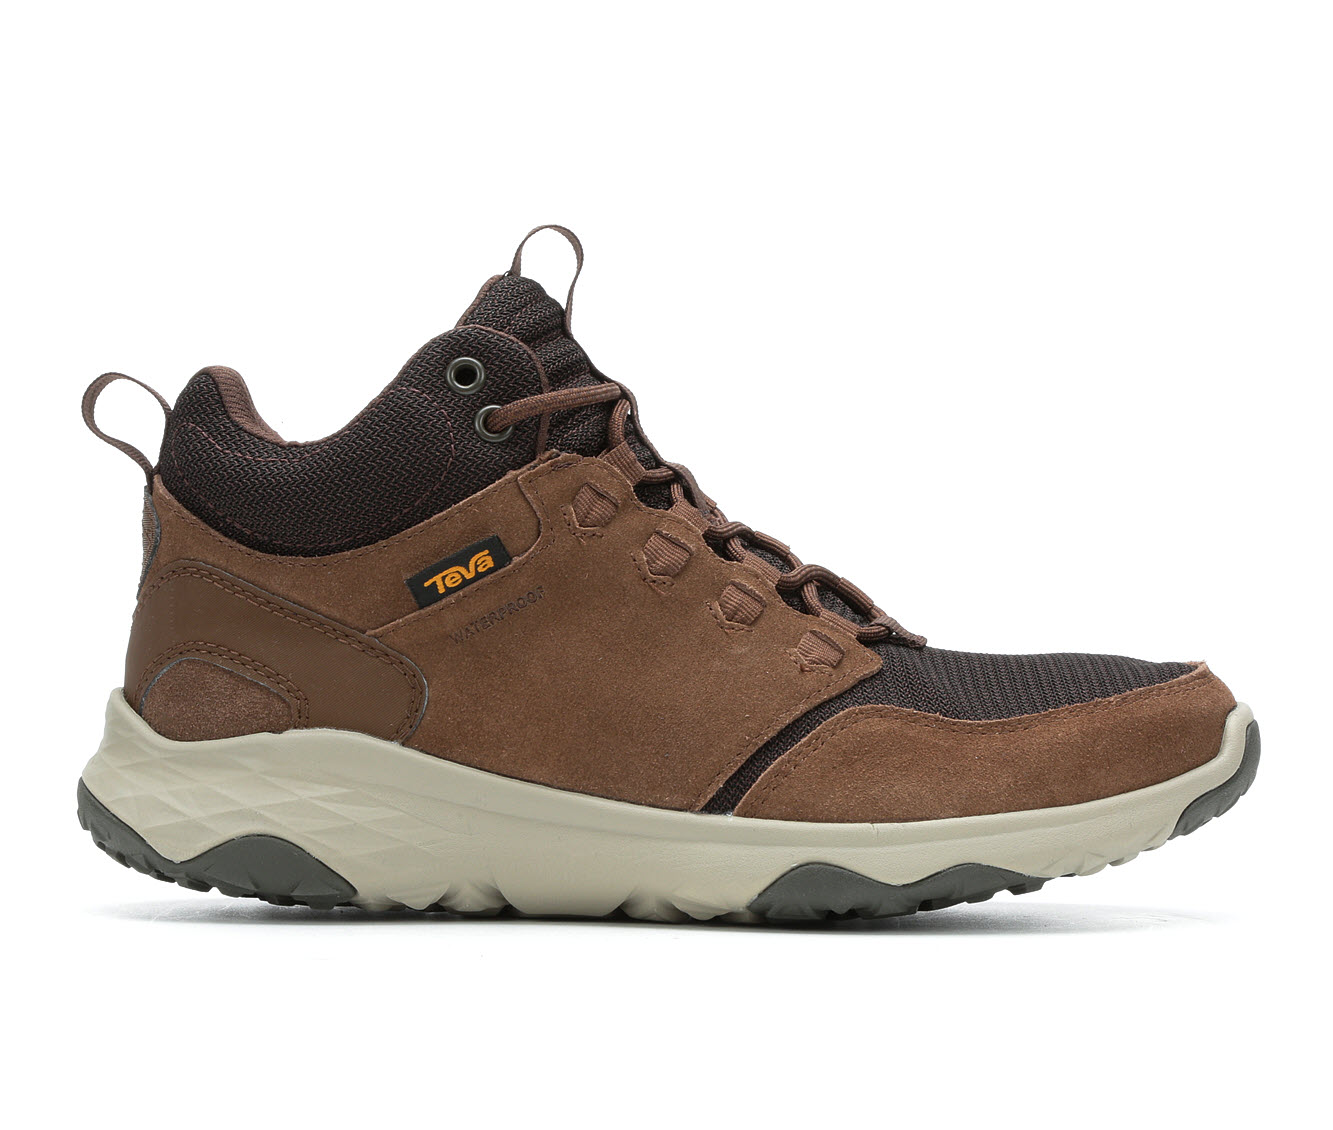 Teva Arrowridge Mid Waterproof Men's Boots (Brown Suede)